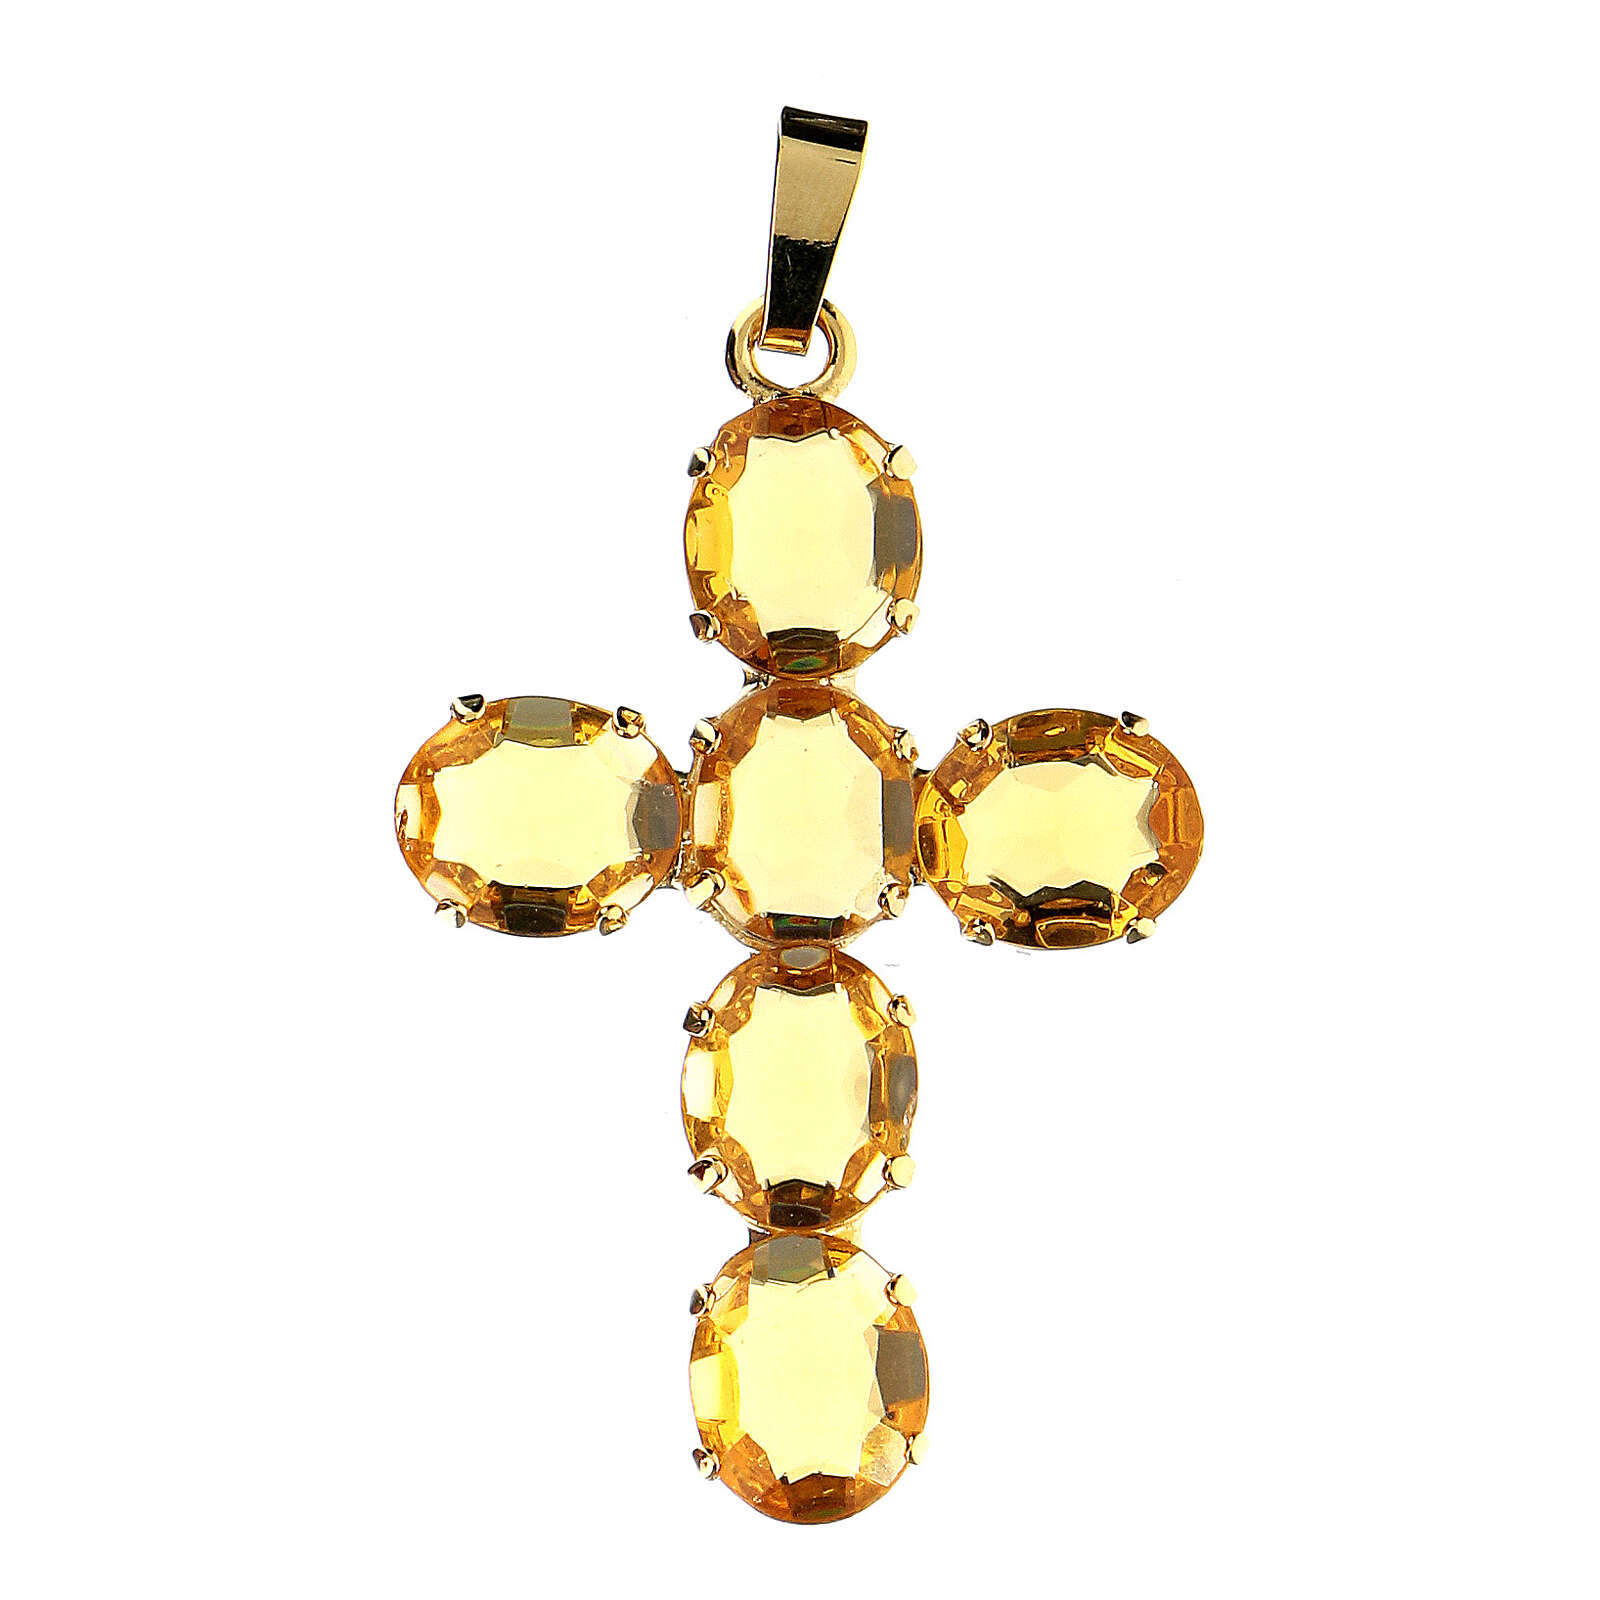 Cruz colgante cristal amarillo ovalado 4